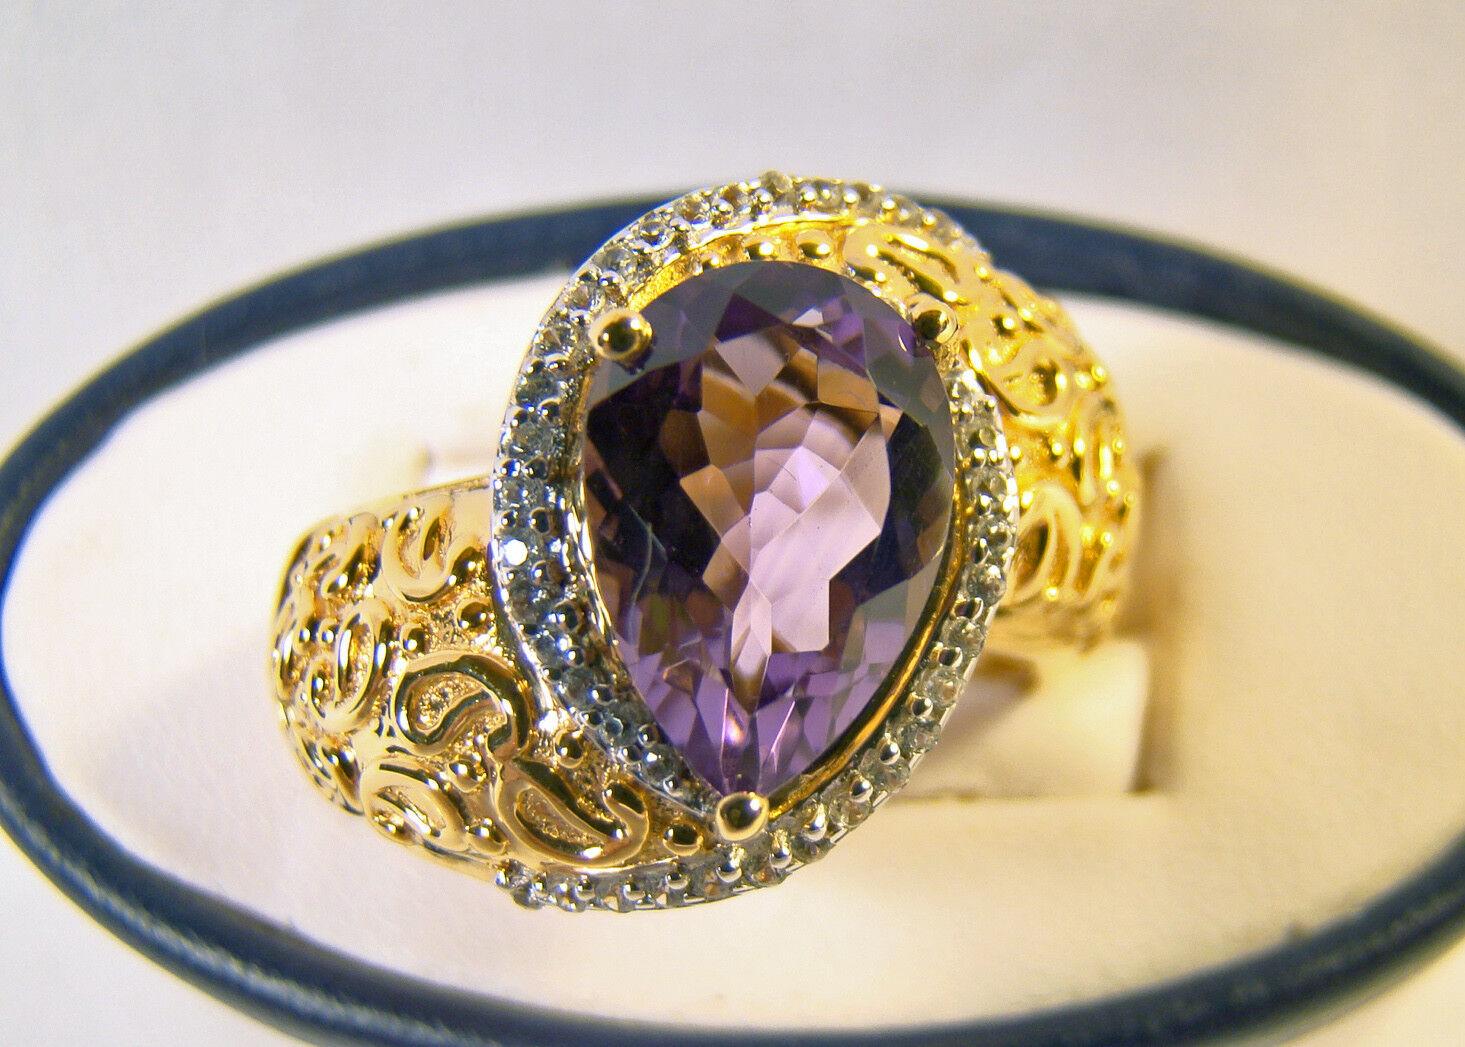 b990dcf1b00e4 Amethyst Genuine Cut Pear ct 3 Beautiful gold Paisley Ring 8.5 Sz ...